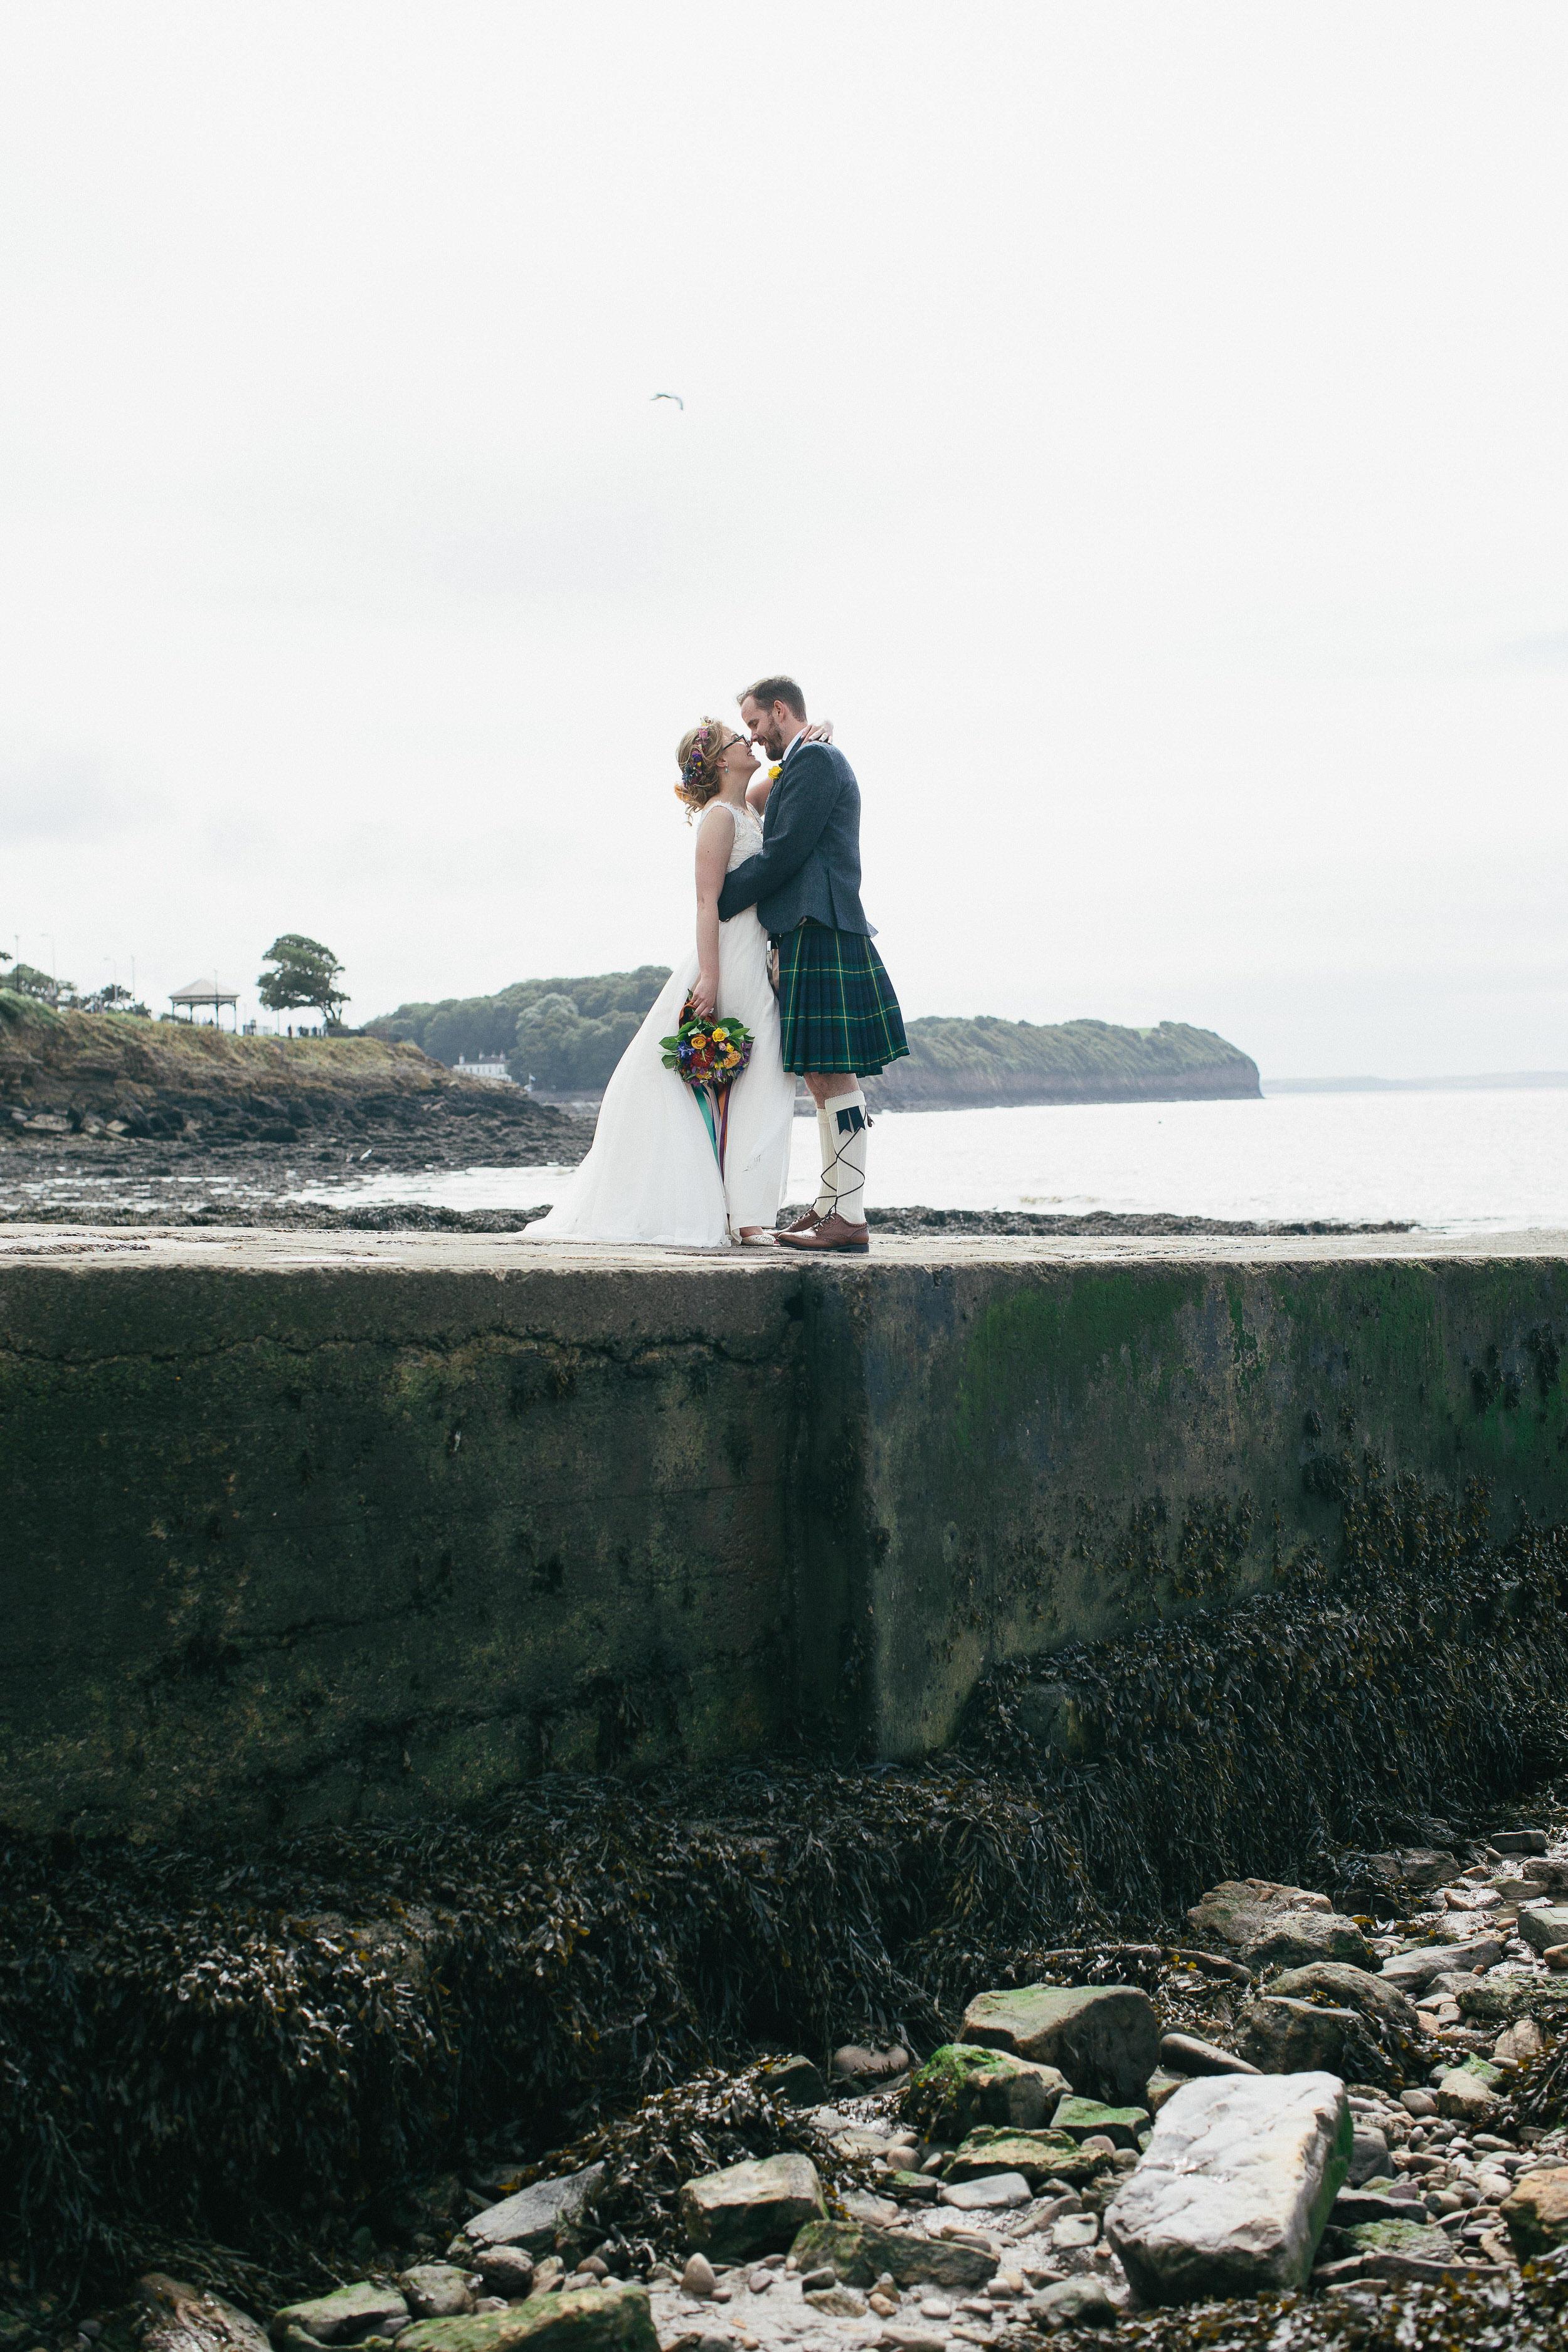 Quirky Wedding Photographer Scotland Glasgow Edinburgh Mirrorbox 110.jpg